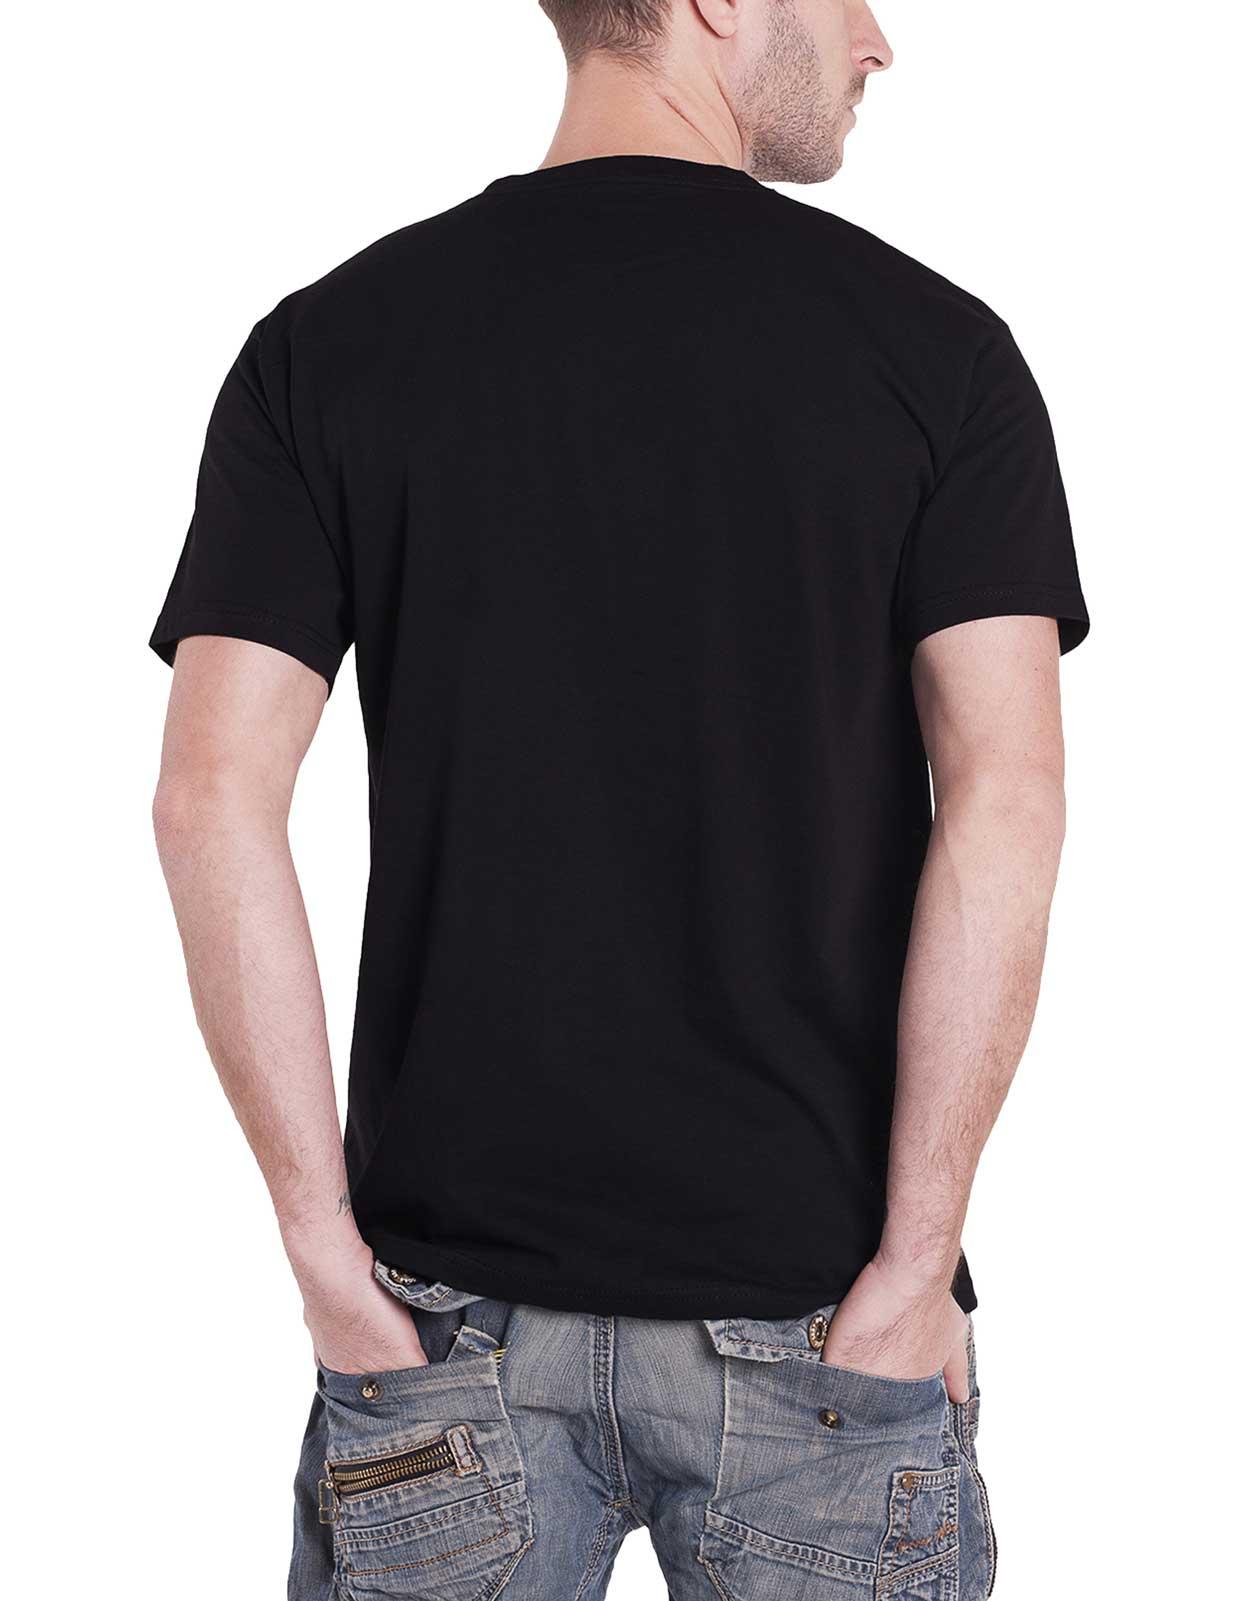 Officiel-Jimi-Hendrix-T-Shirt-Purple-Haze-Are-you-experienced-Logo-Homme-NEUF miniature 13